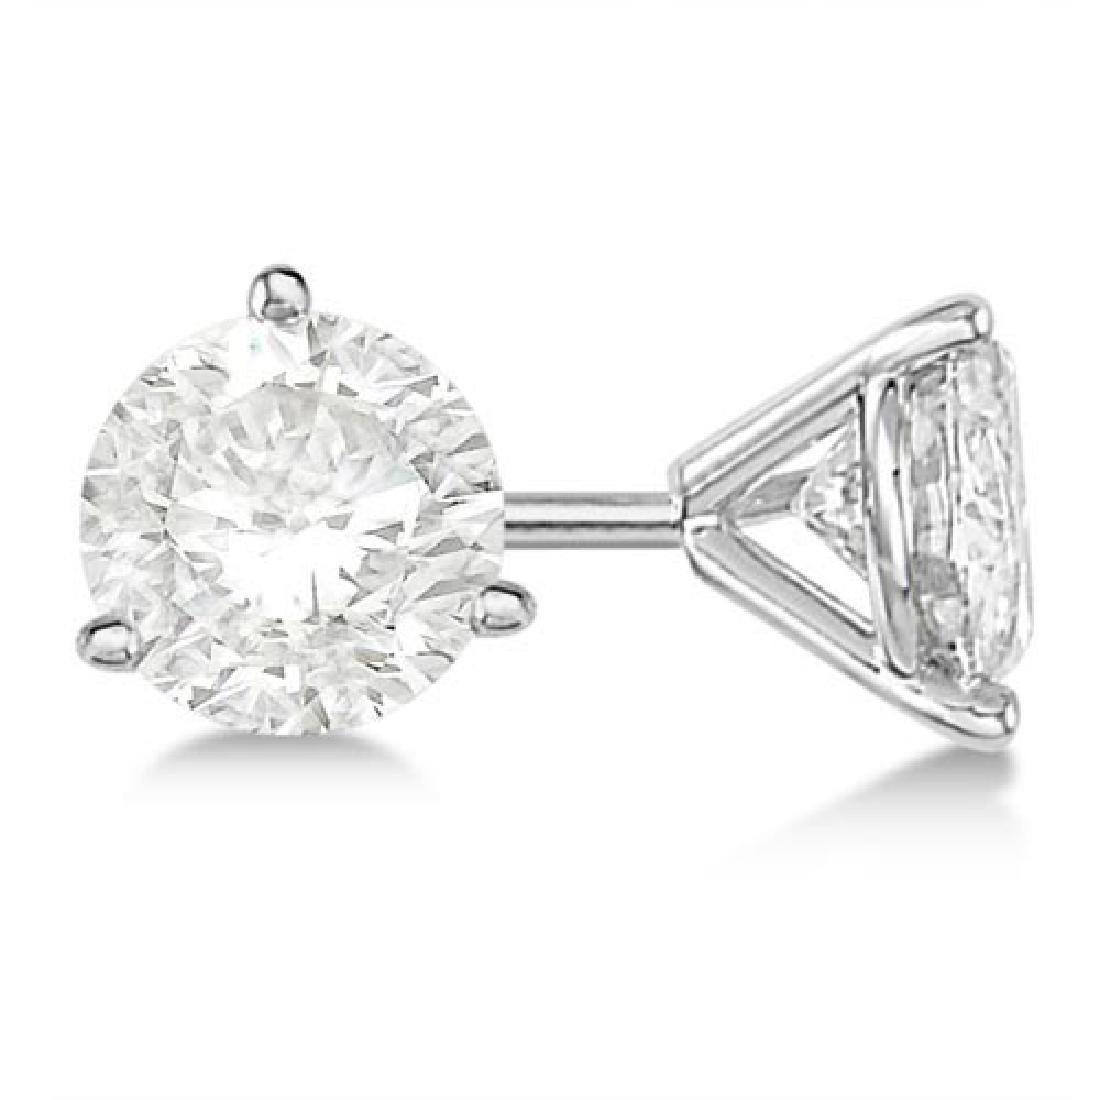 2.50ct. 3-Prong Martini Diamond Stud Earrings Platinum